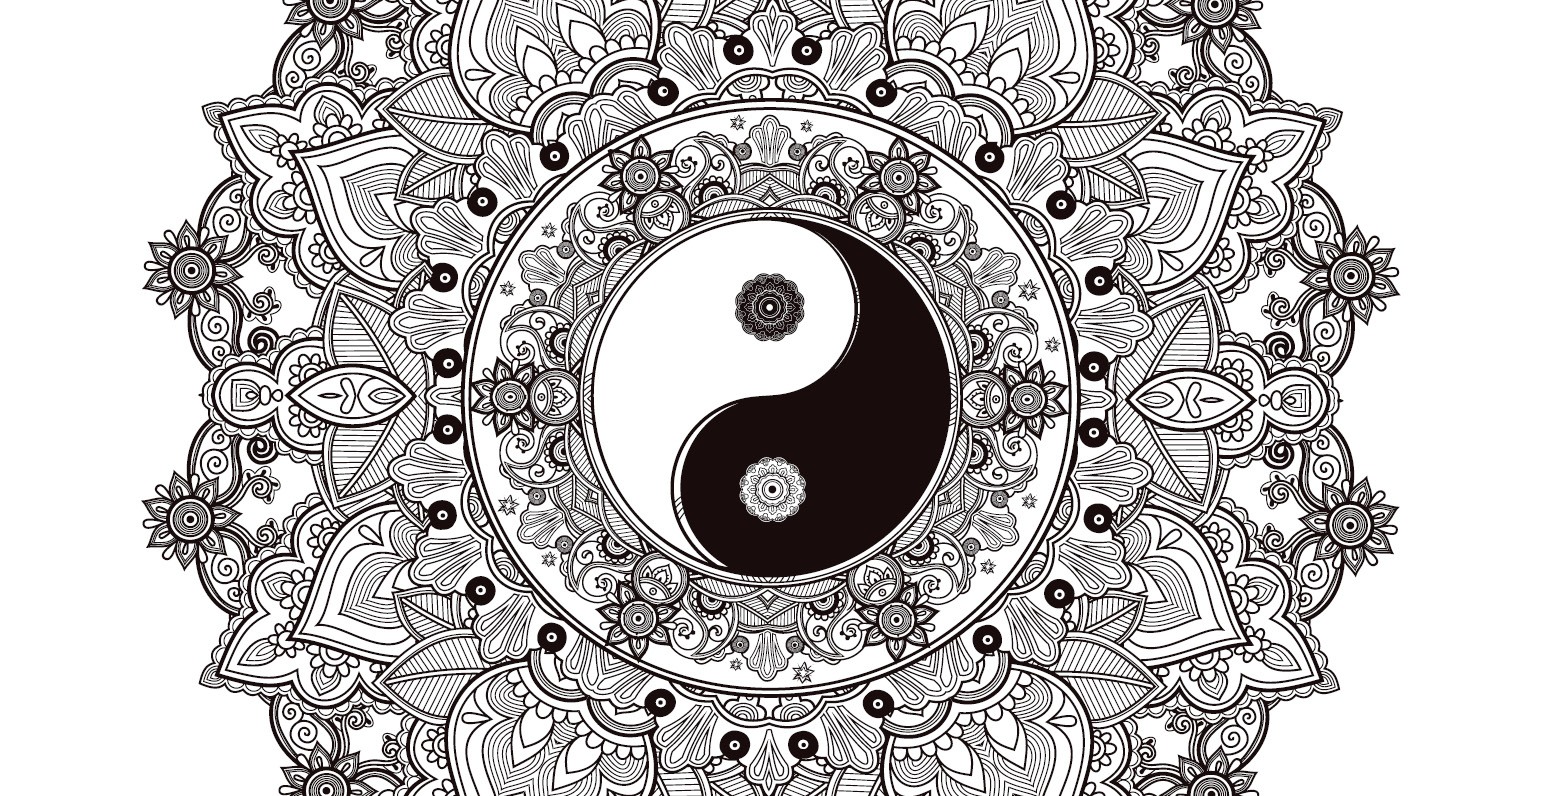 artherapie coloriage gratuit freedesignfile yingyang - Dessin De Mandala